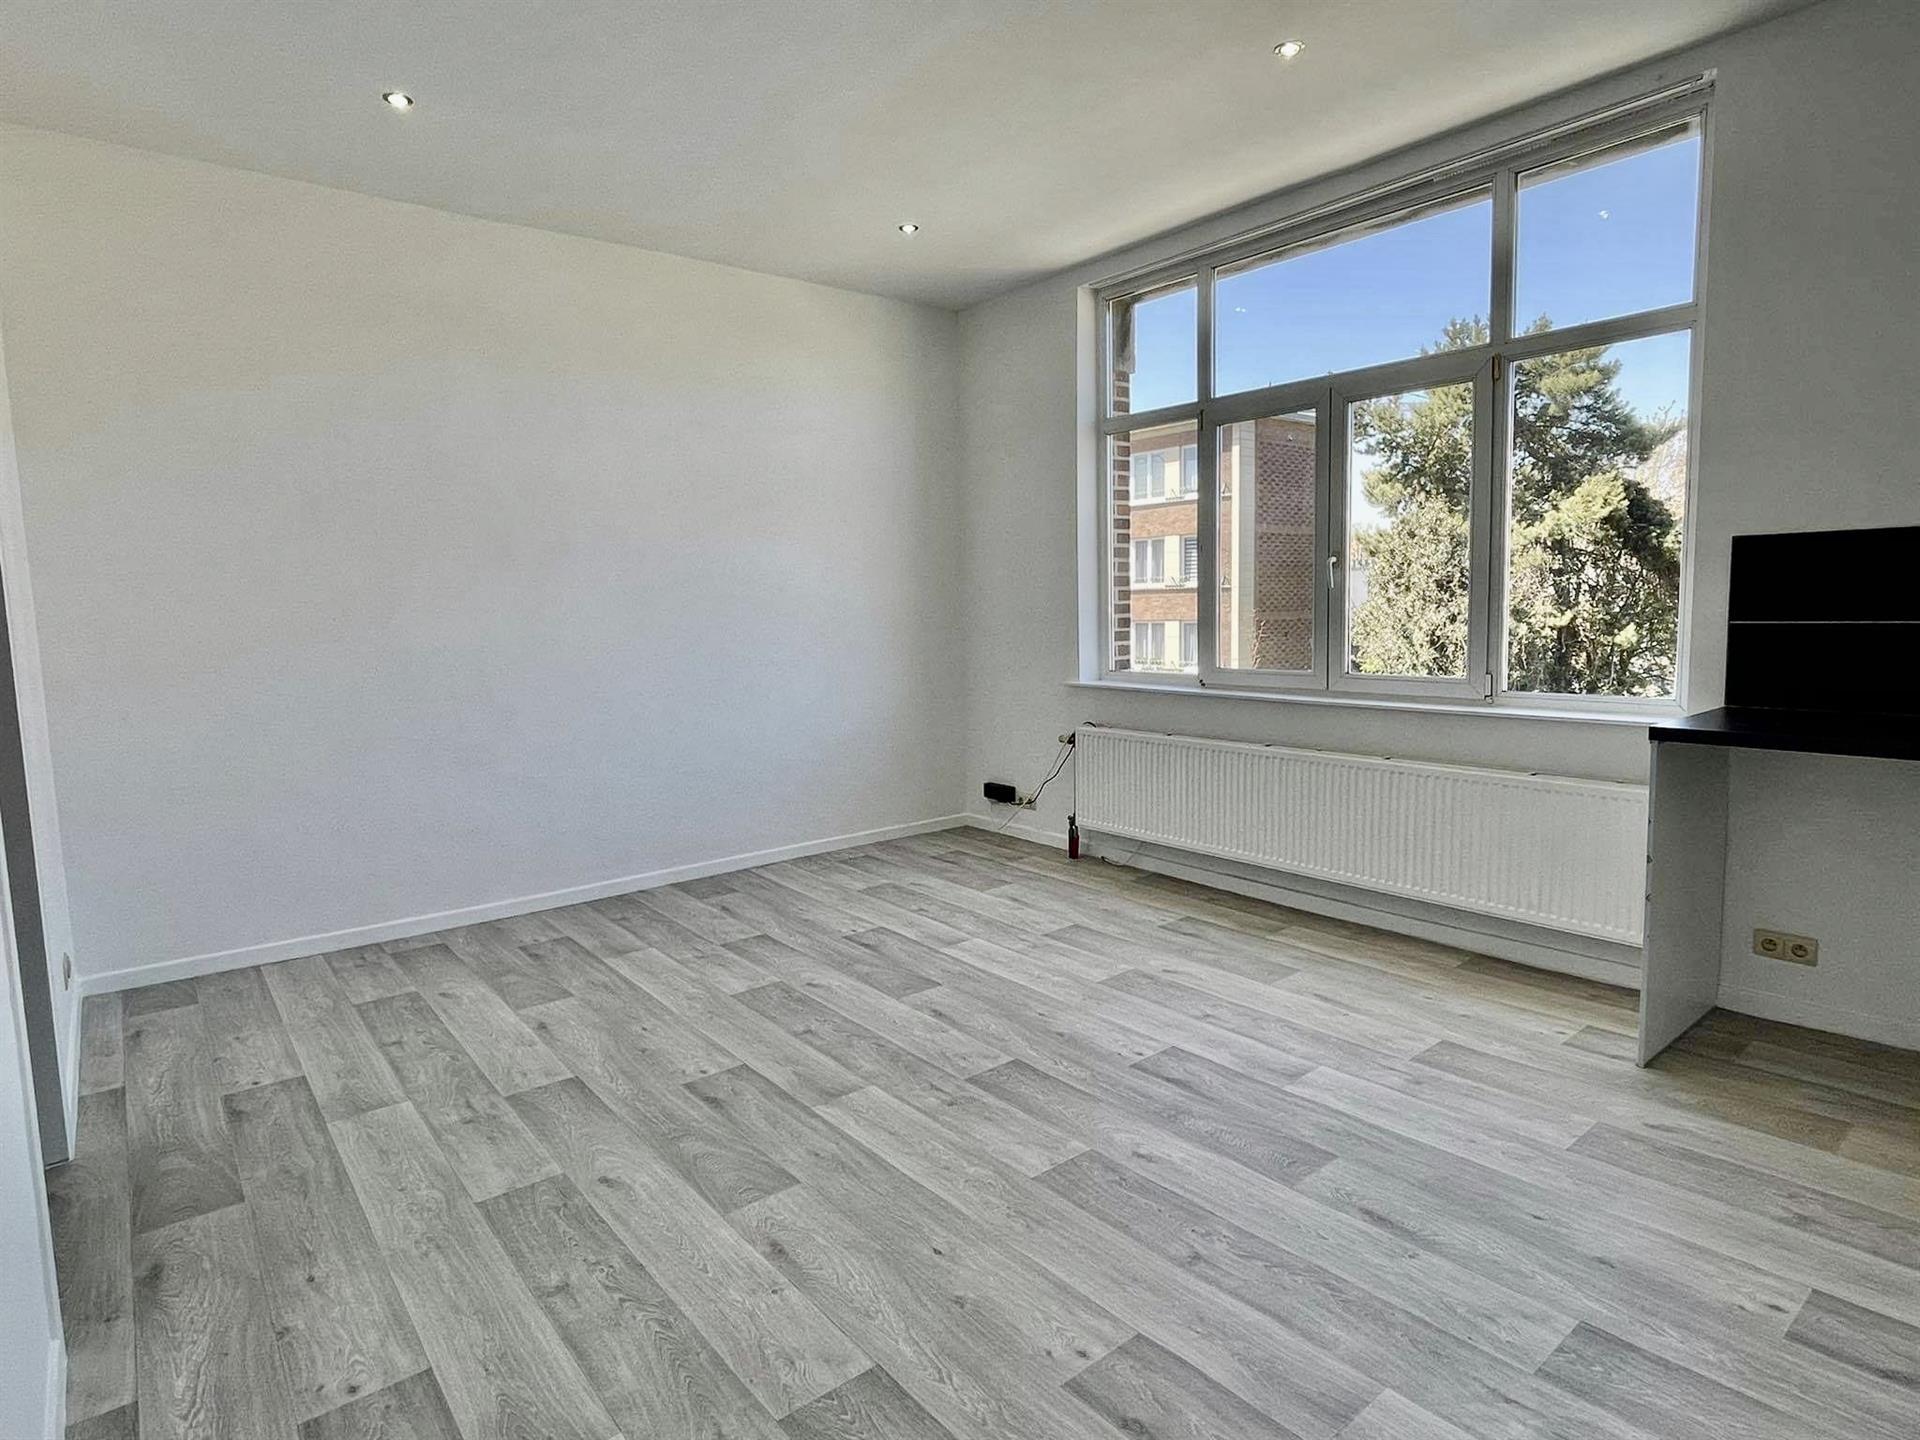 Appartement - Molenbeek-Saint-Jean - #4343762-2